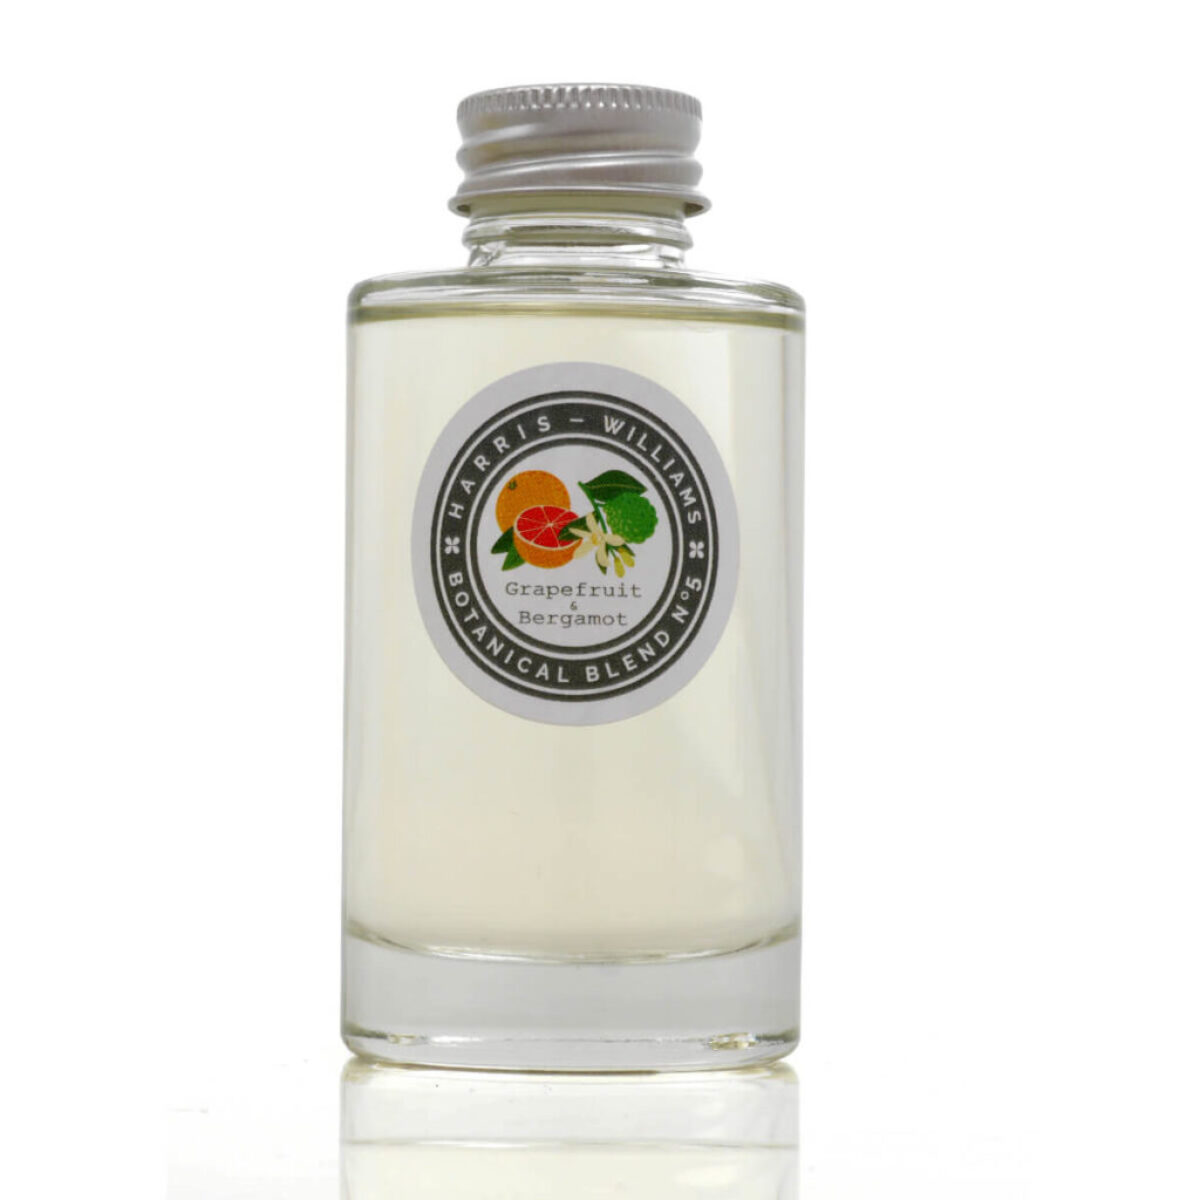 Botanical Blend No 5 Grapefruit & Bergamot Diffuser Refill